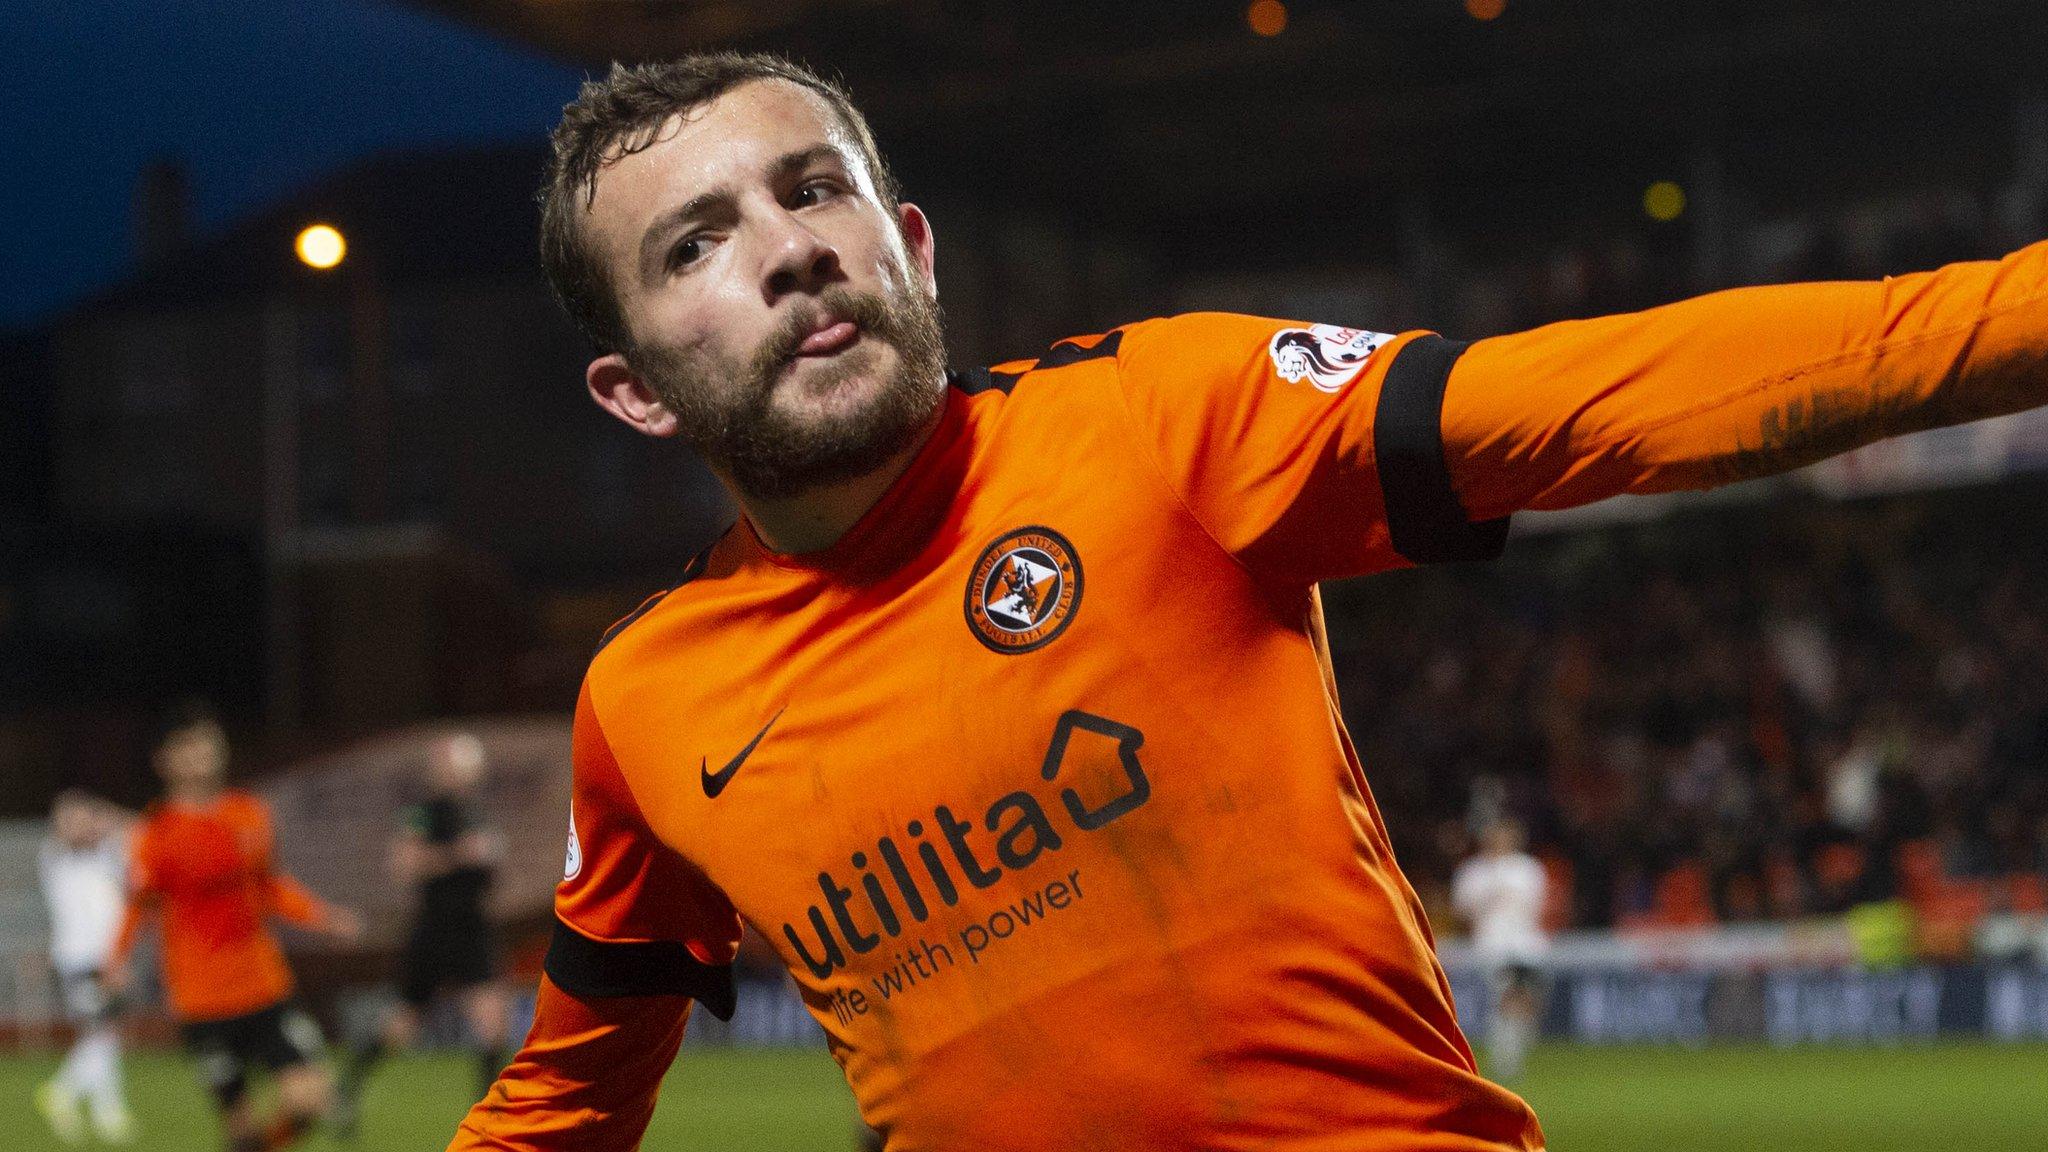 Dundee Utd 2-1 Ayr Utd: Paul McMullan & Pavol Safranko goals earn win